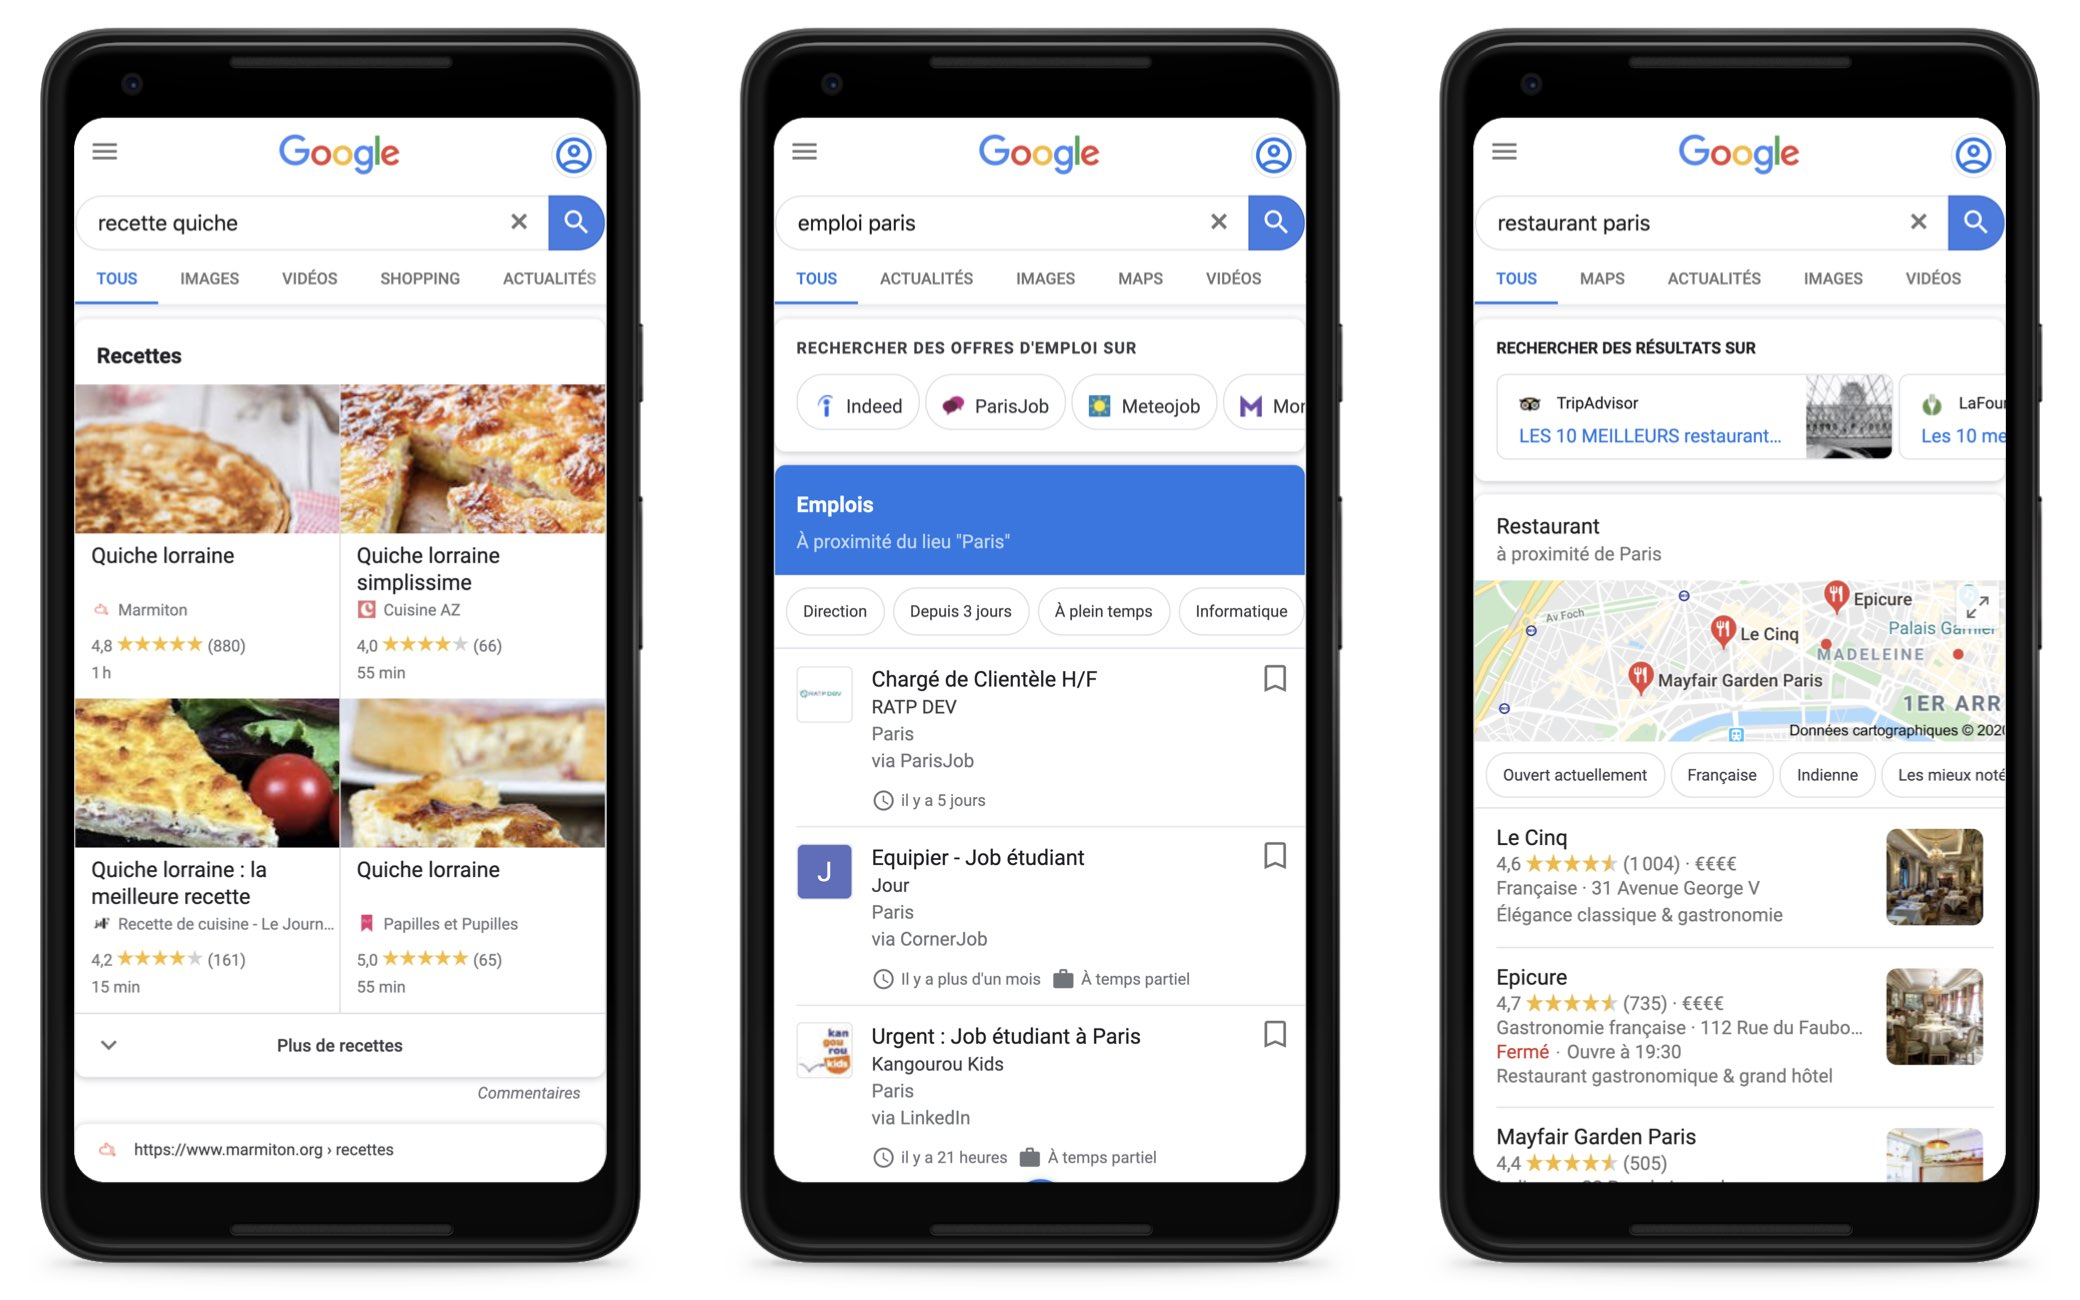 recette, emploi, restaurant in Google